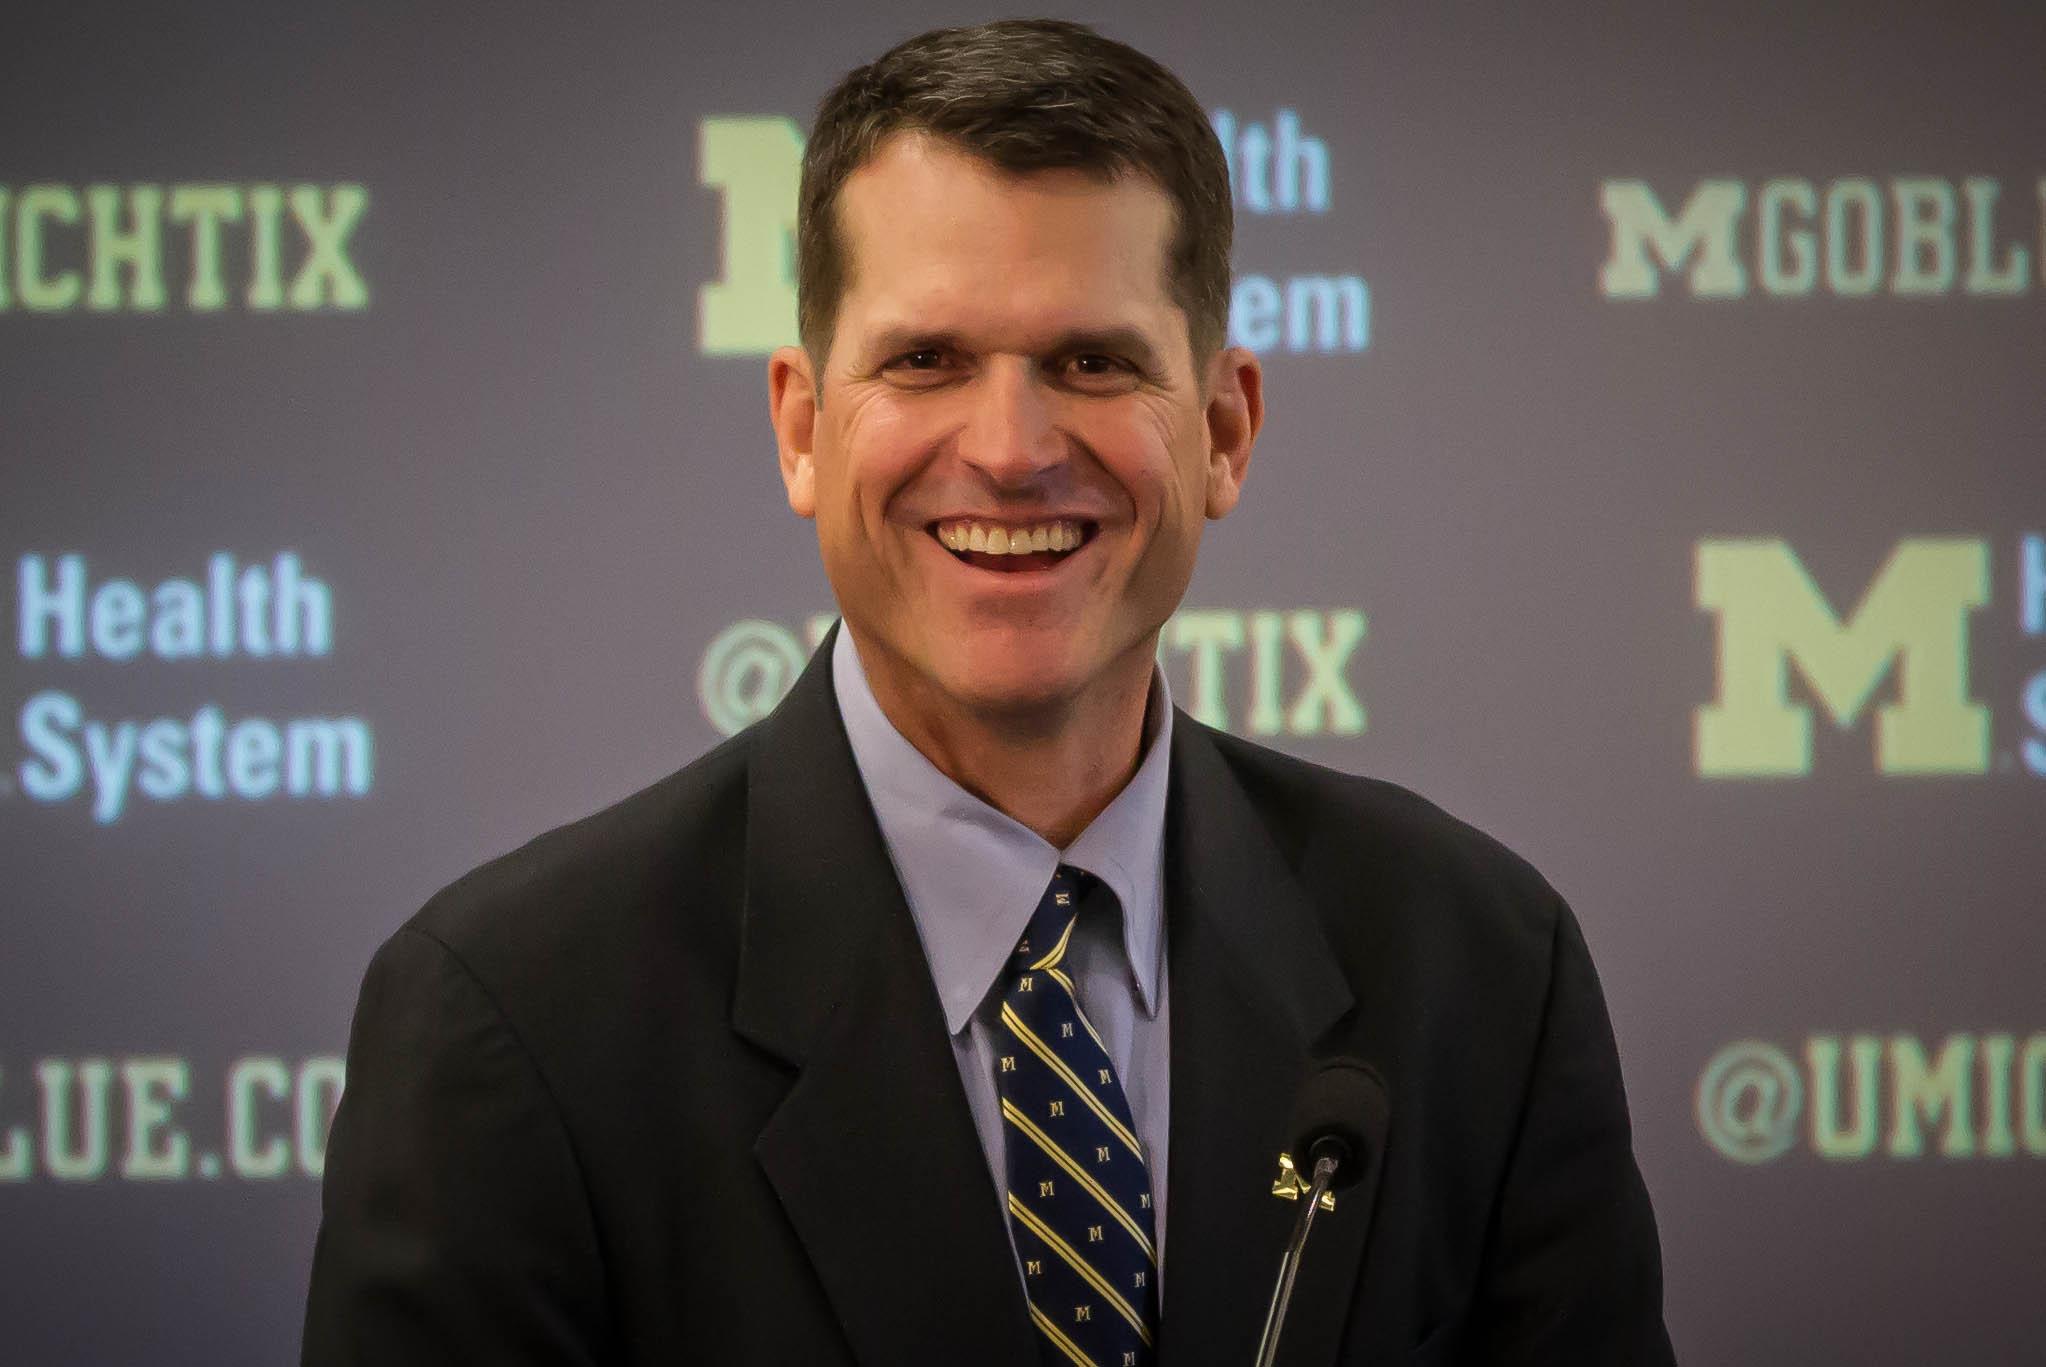 Jim_Harbaugh_Head_Coach_University_of_Michigan.jpg